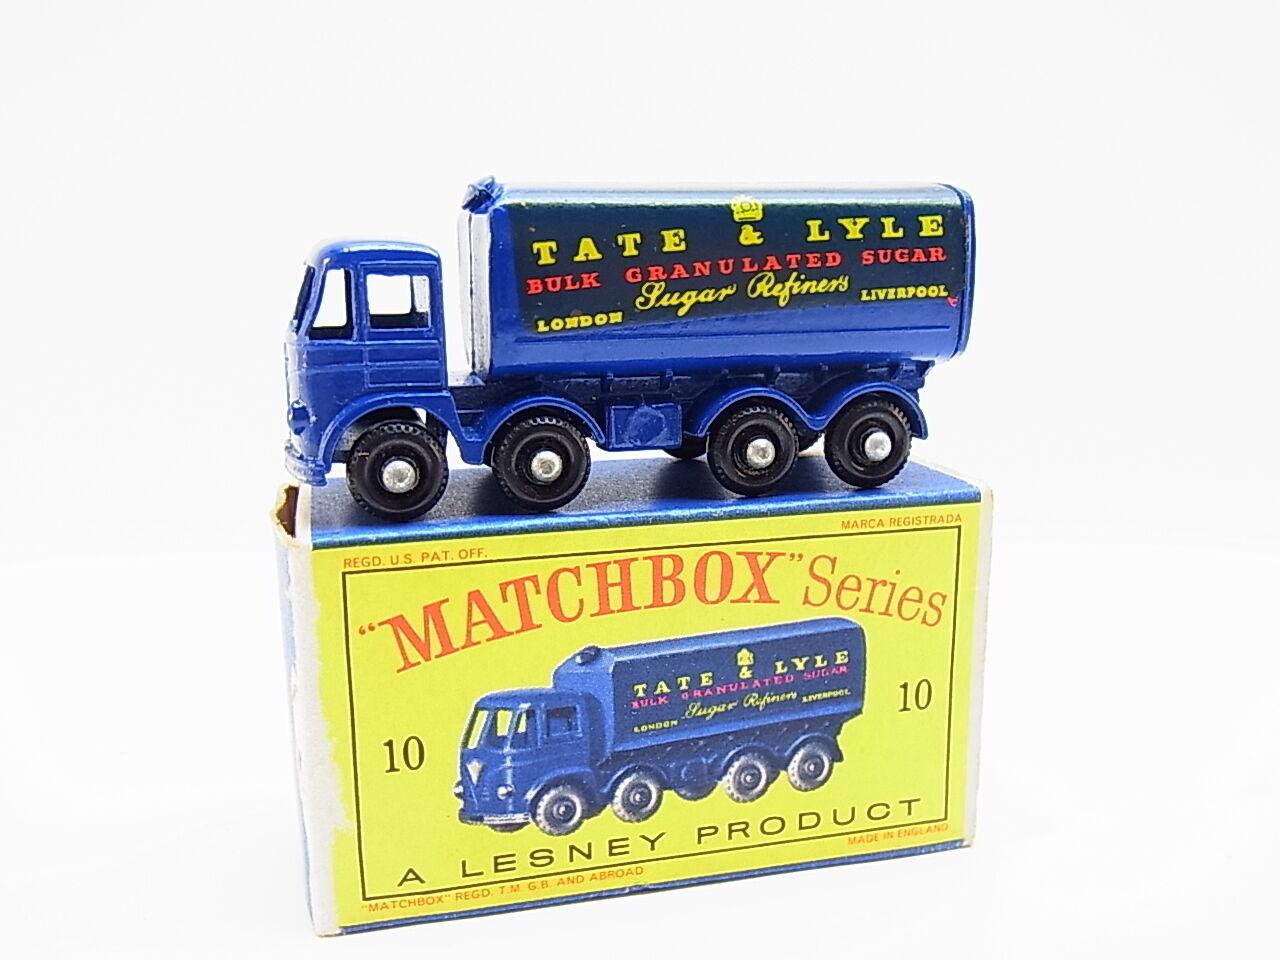 LOT 33332   Matchbox 10 C Foden 15t Sugar Container Modell neuwertig  D -Box  | Verschiedene Stile